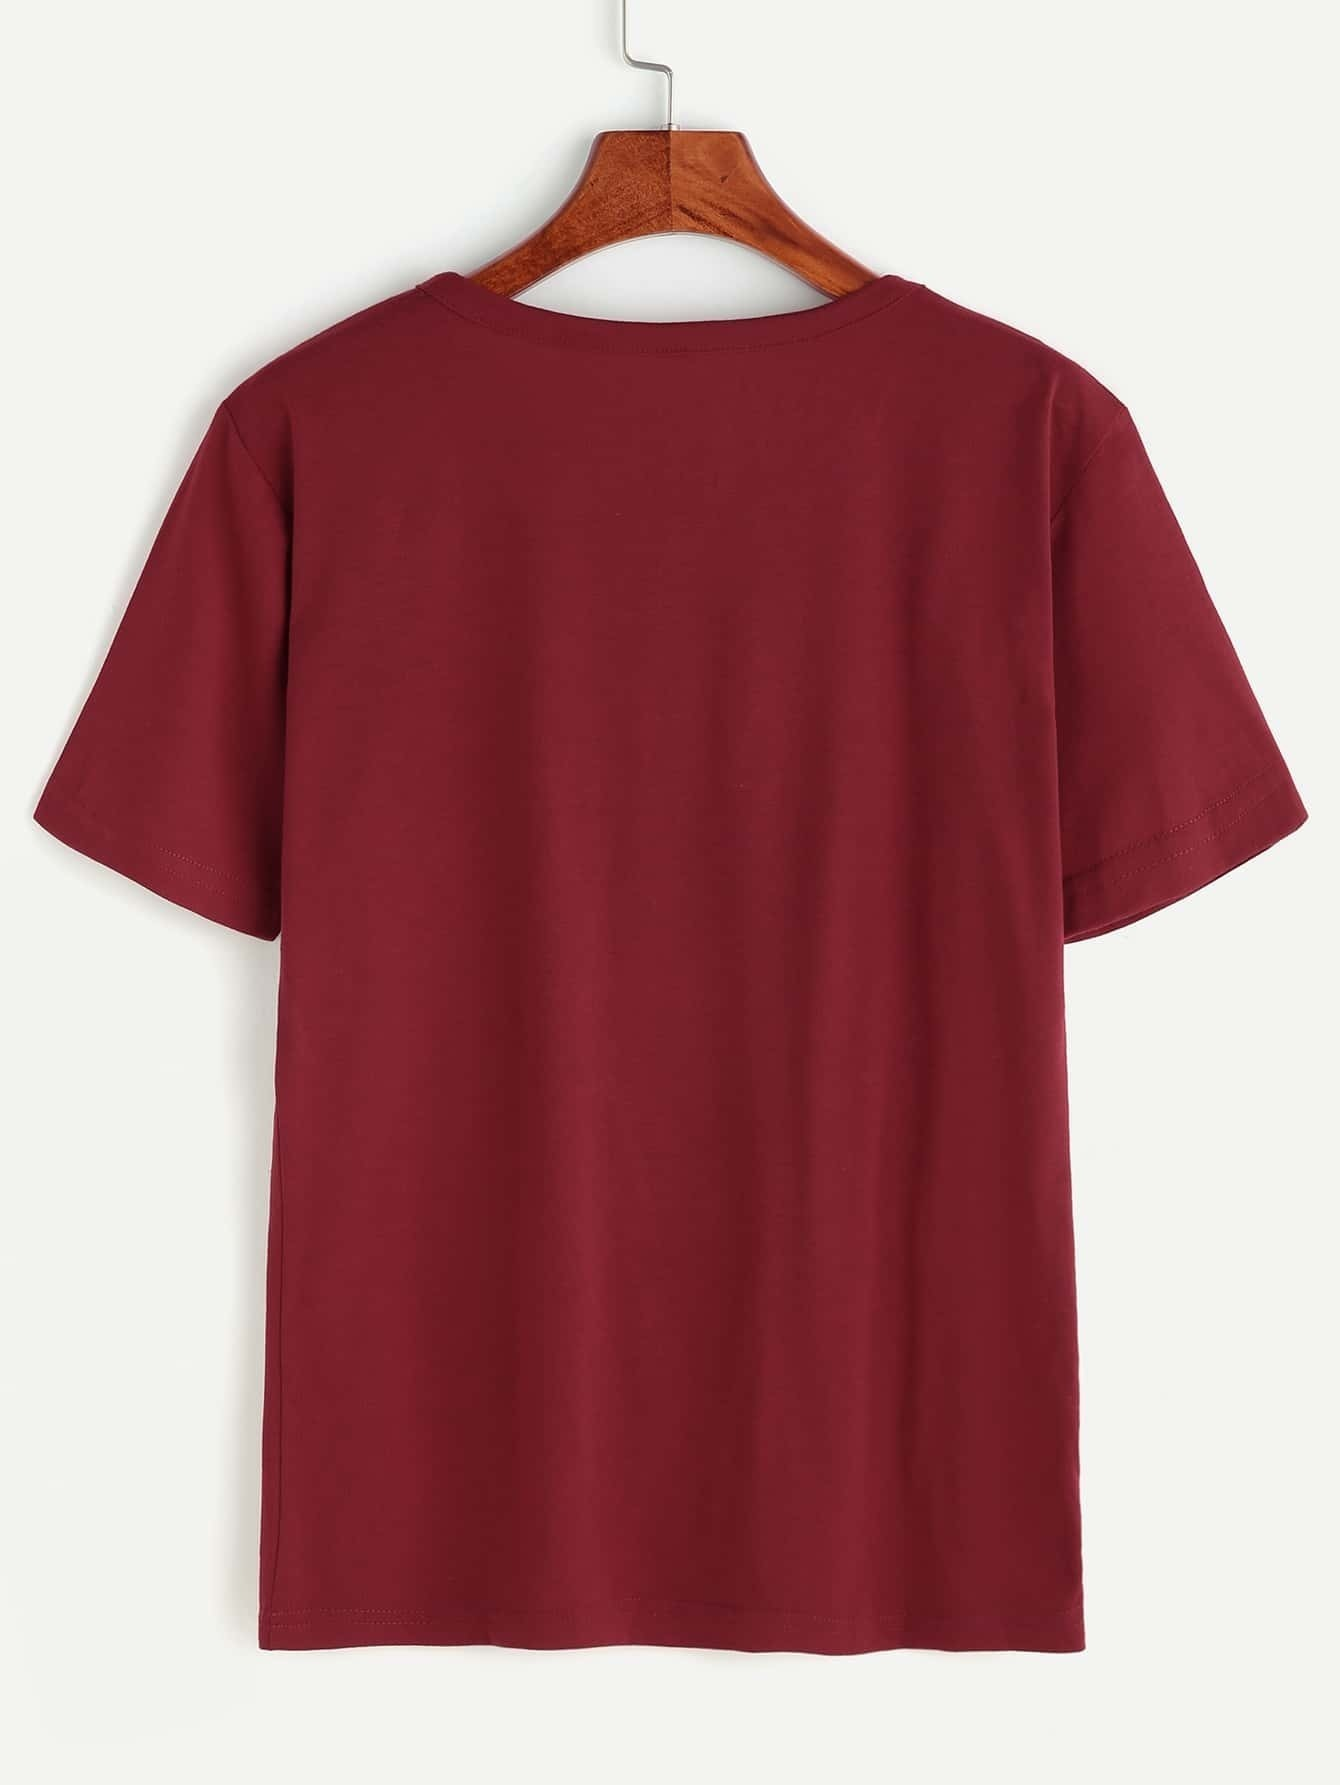 bourgogne slogan imprimer manches courtes t shirt french romwe. Black Bedroom Furniture Sets. Home Design Ideas